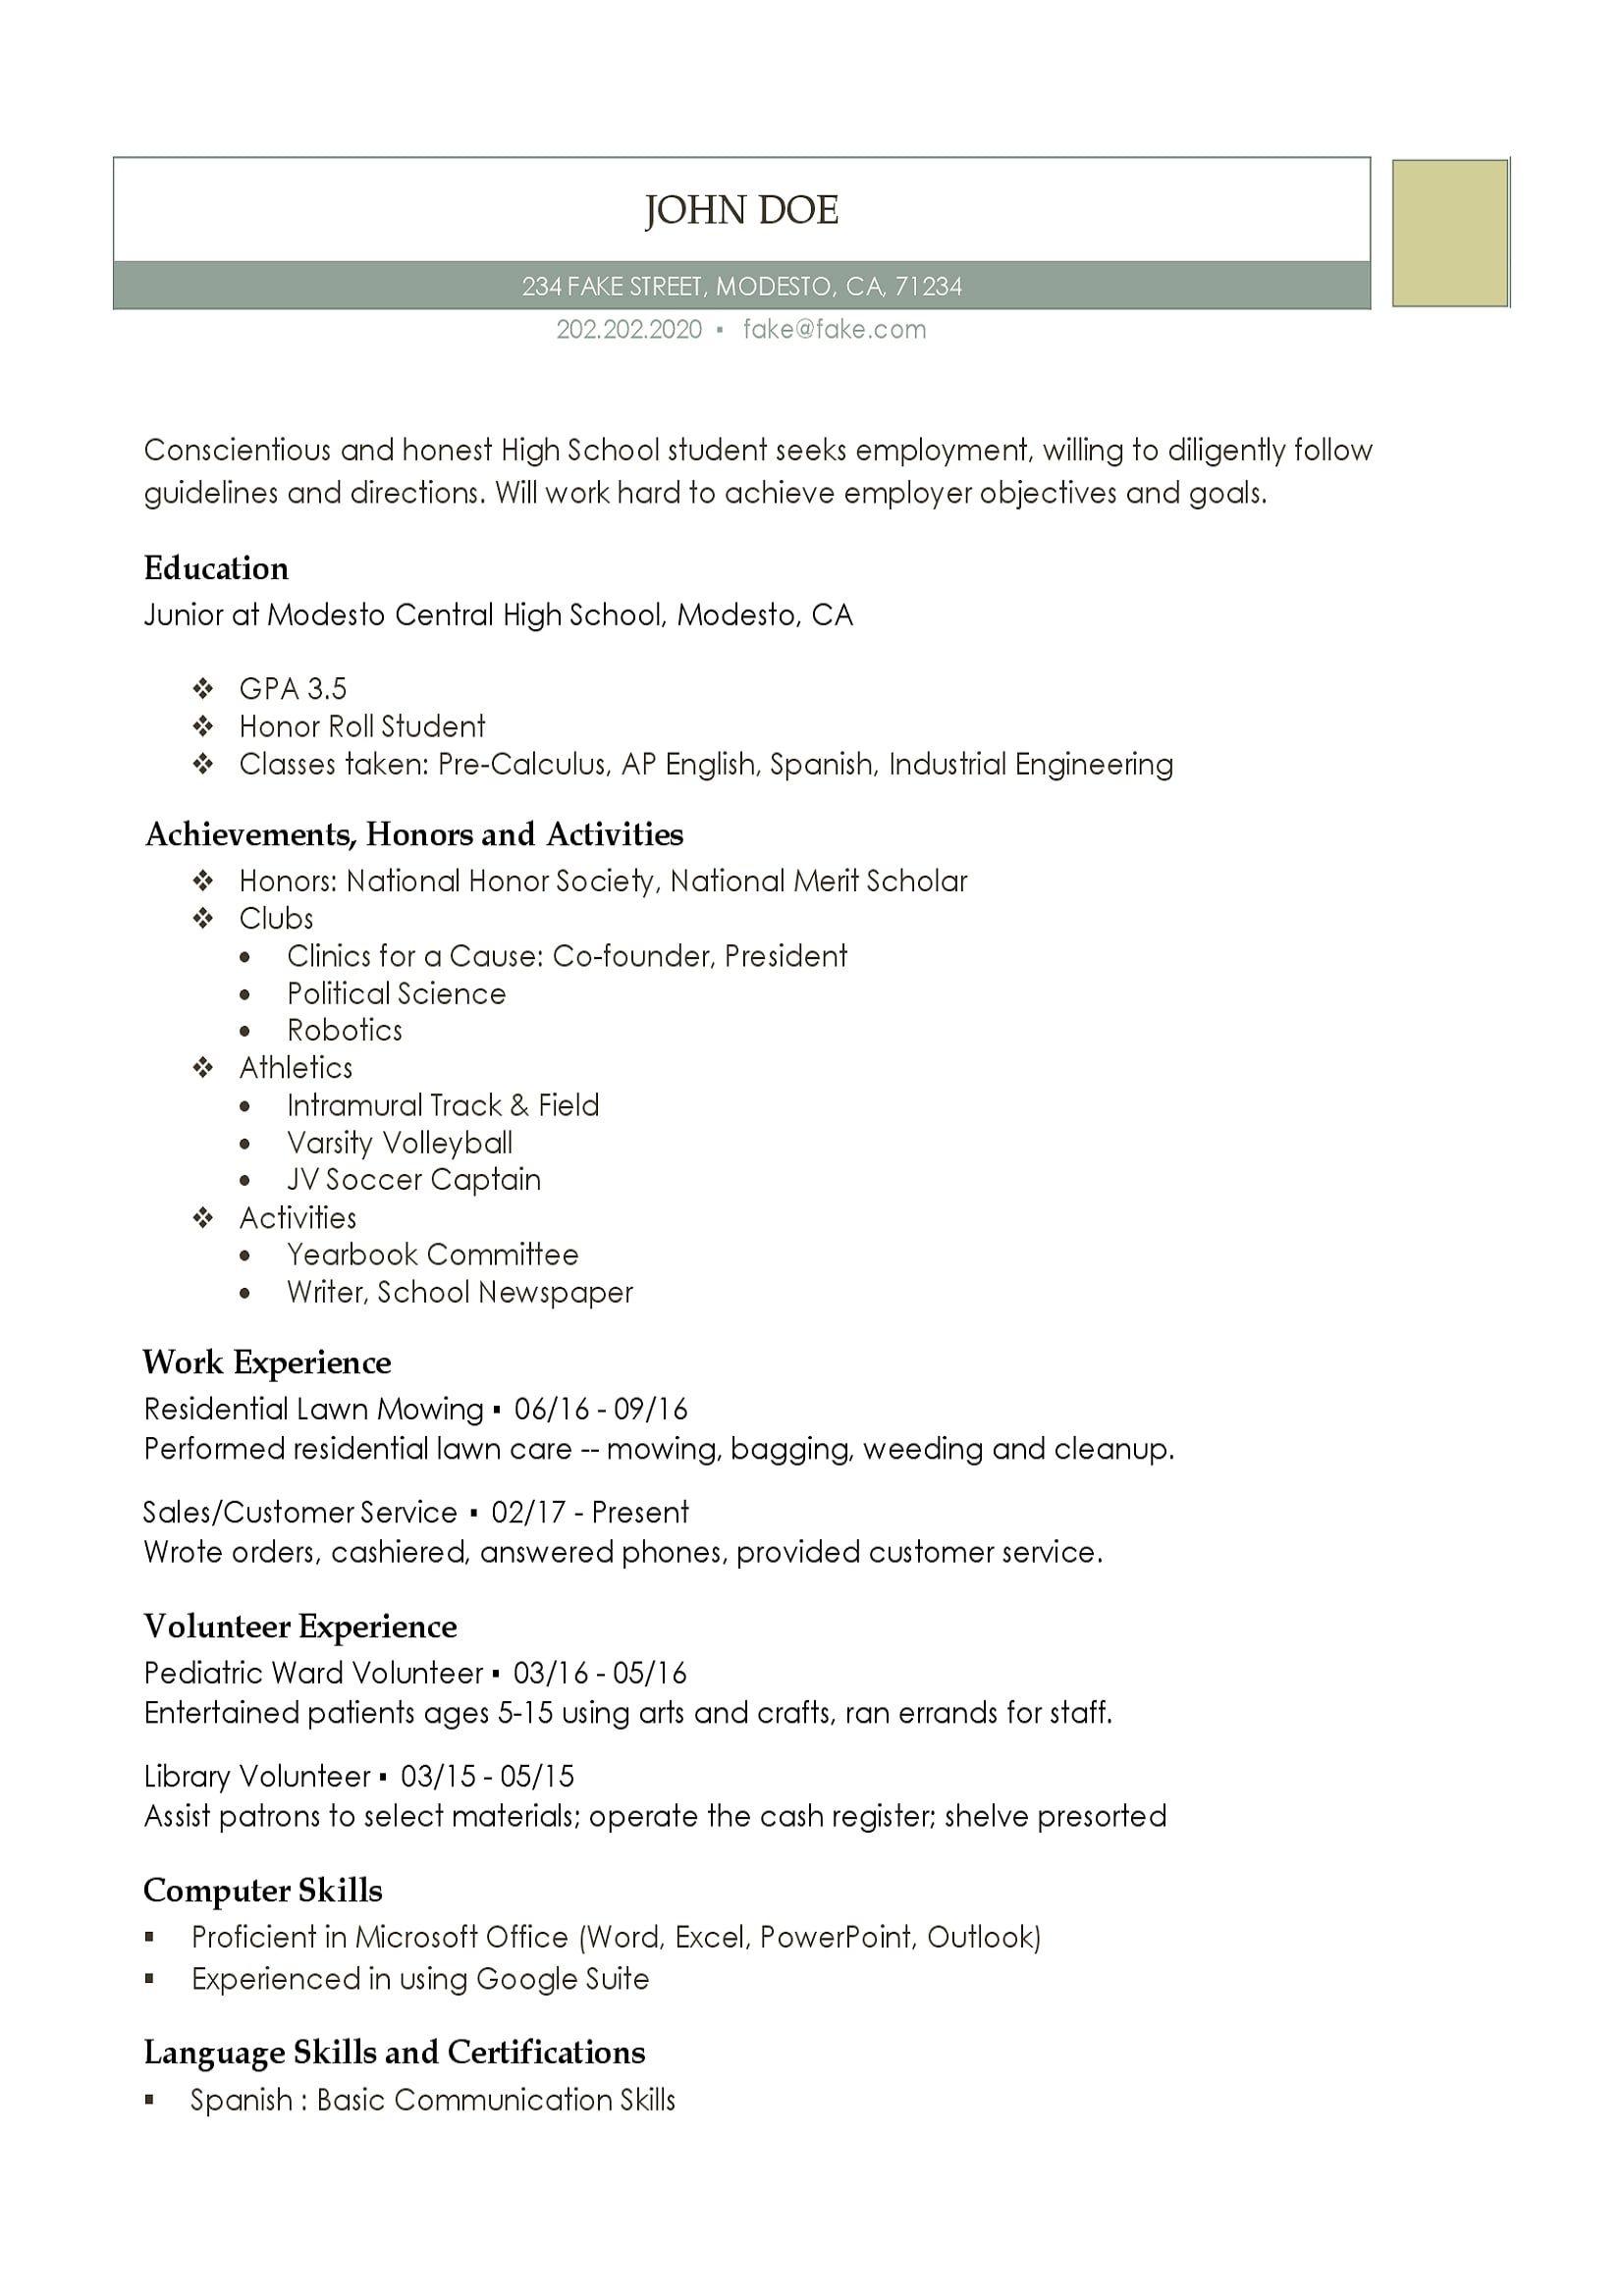 003 Stunning Resume Template For Teen Design  Teenager First Job AustraliaFull